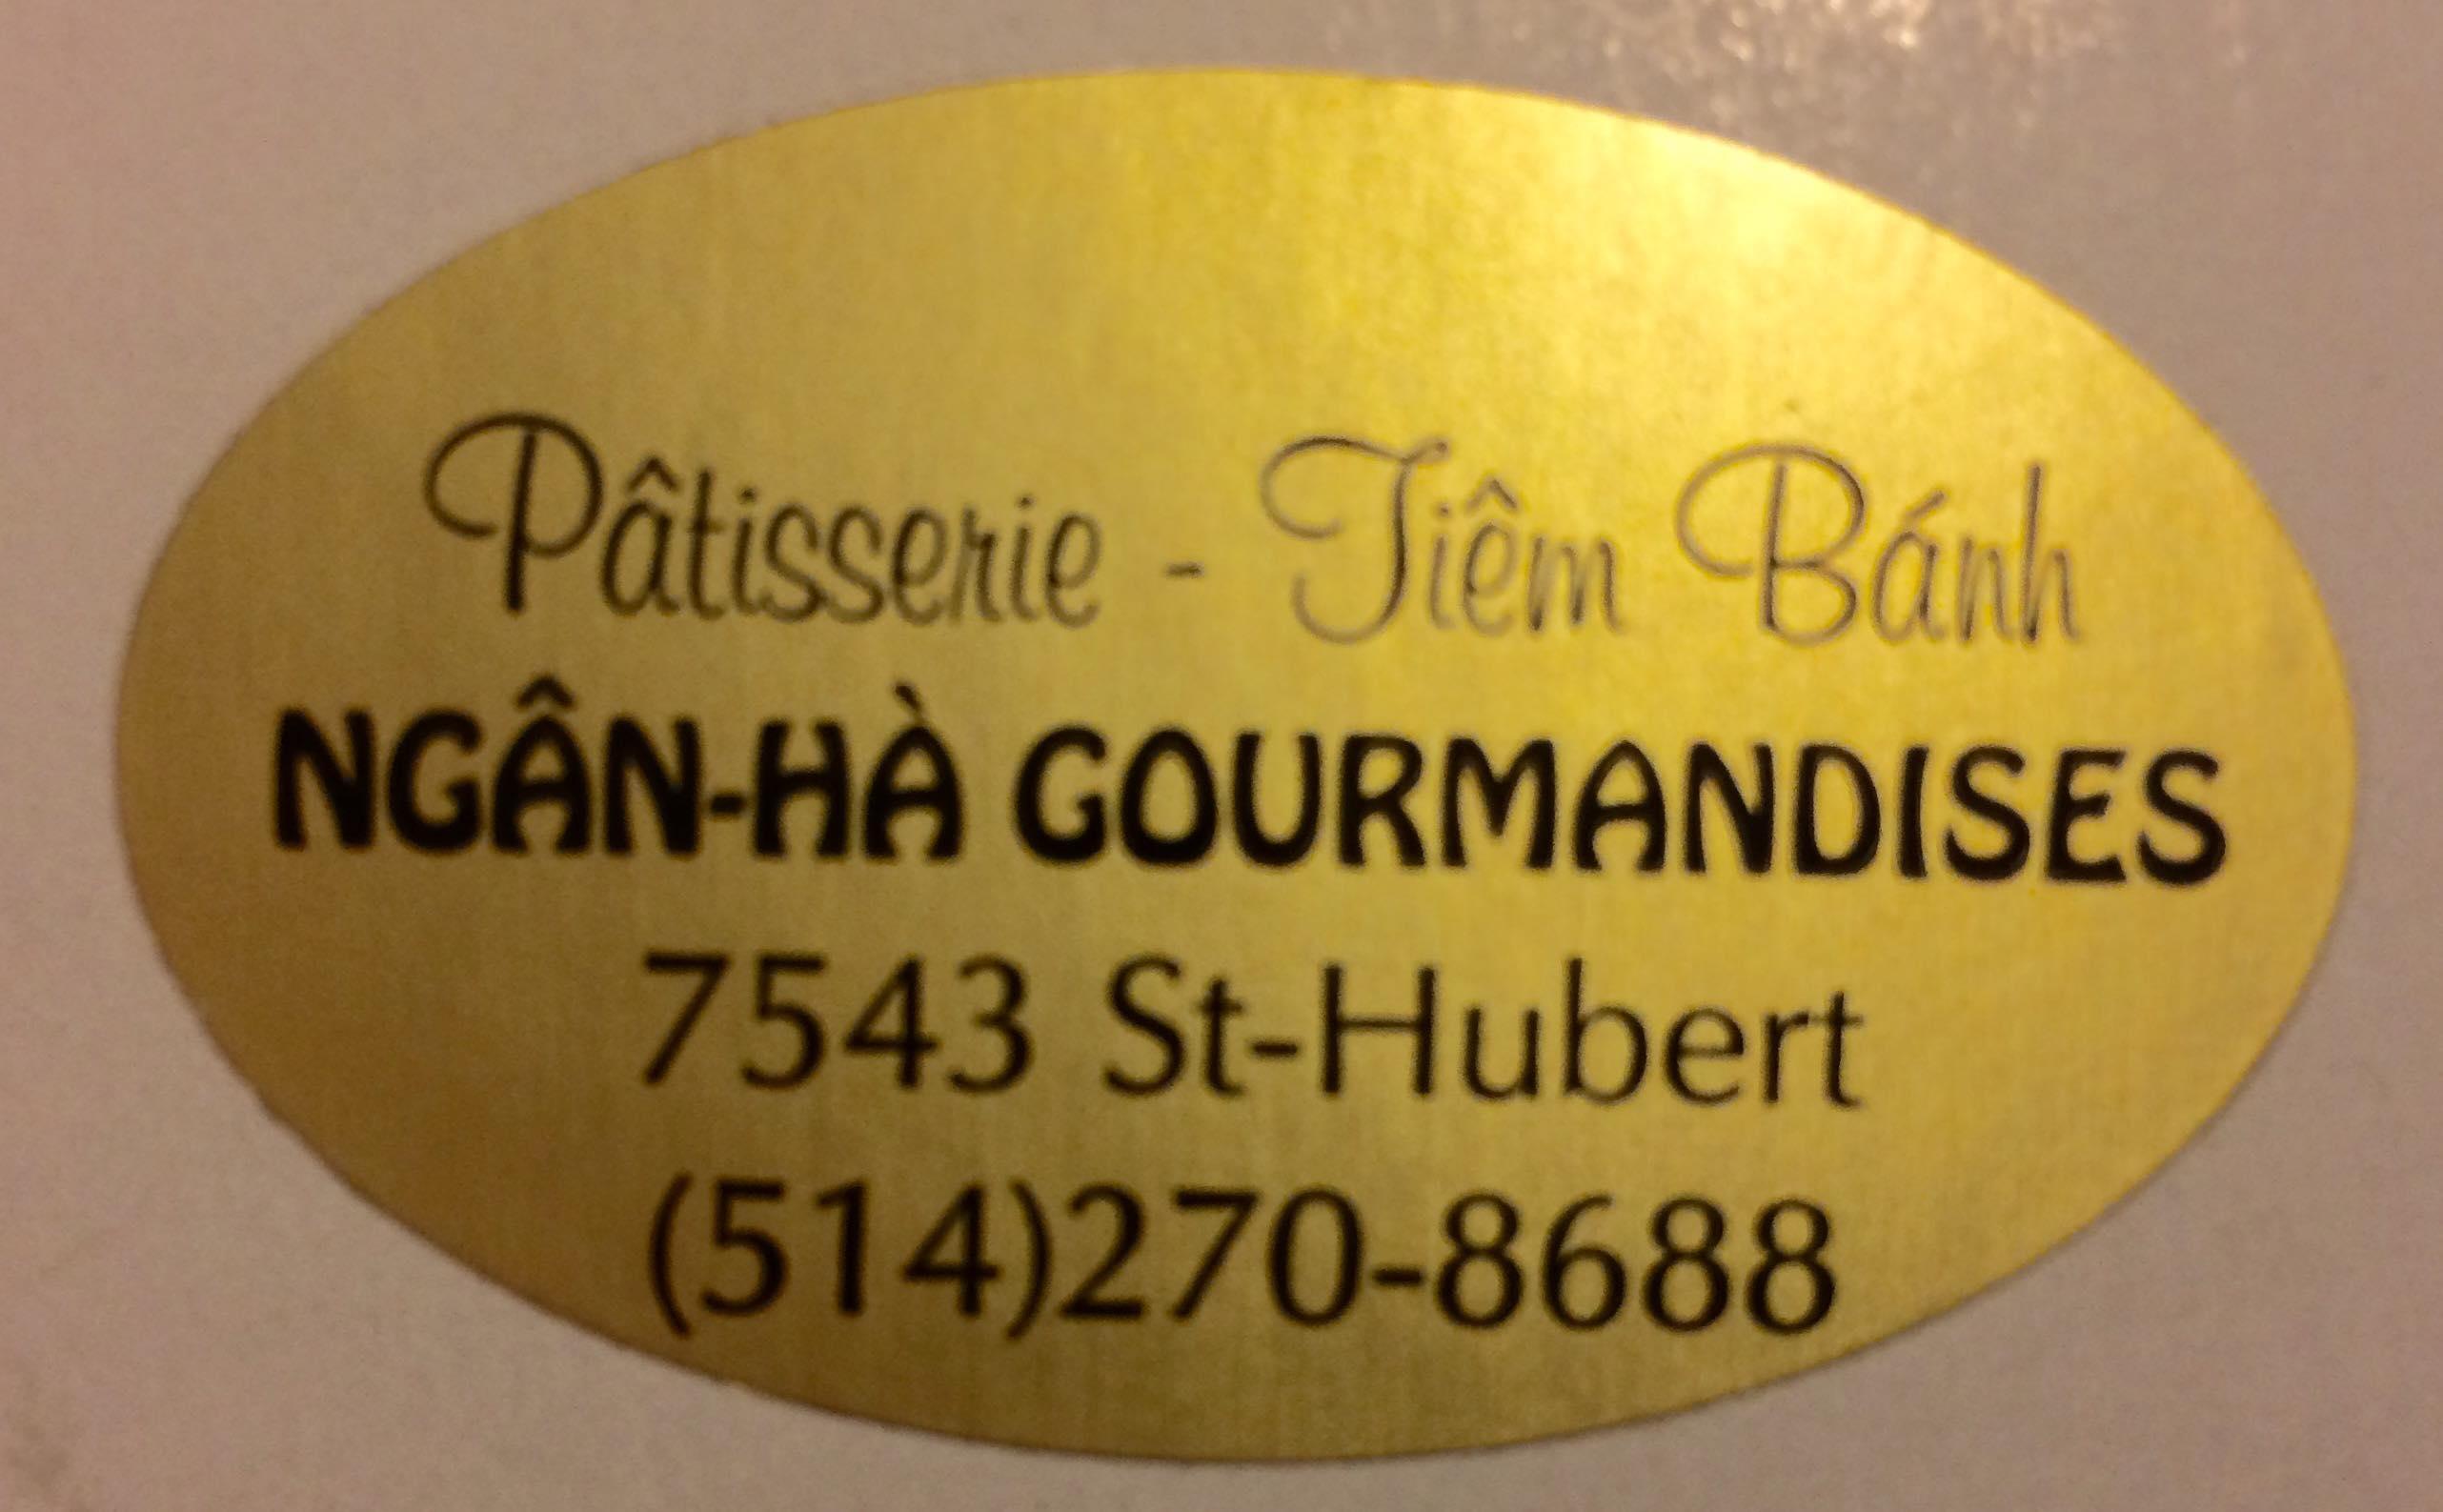 Patisserie Ngân Hà Gourmandises - Bakery